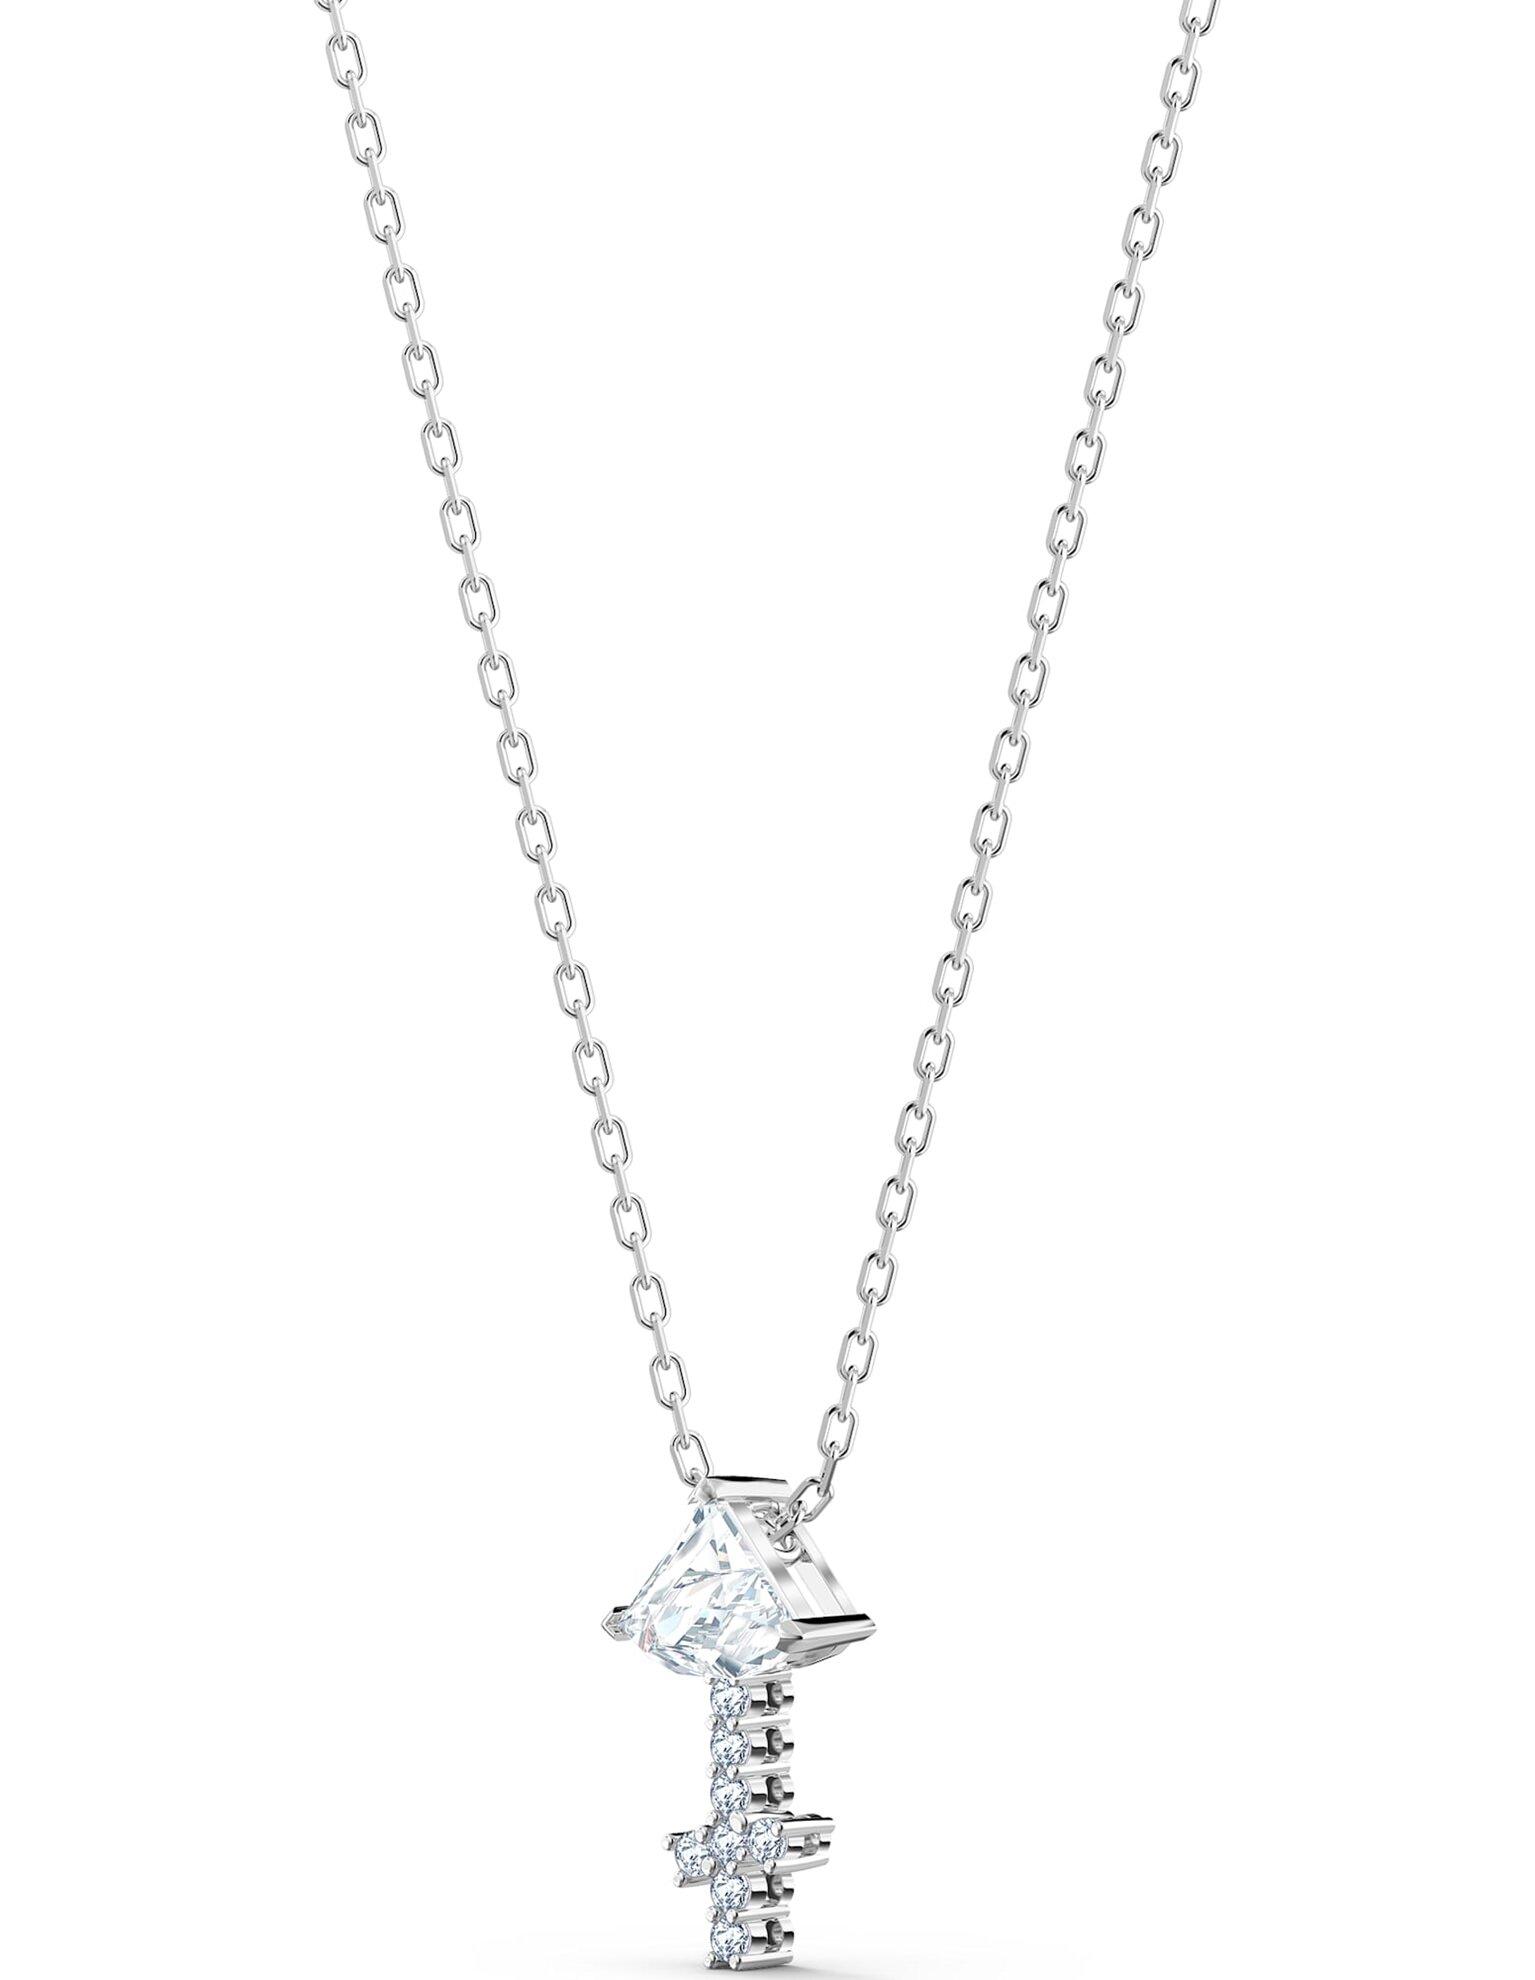 Picture of Zodiac II kolye, Yay, Beyaz, Karışık metal